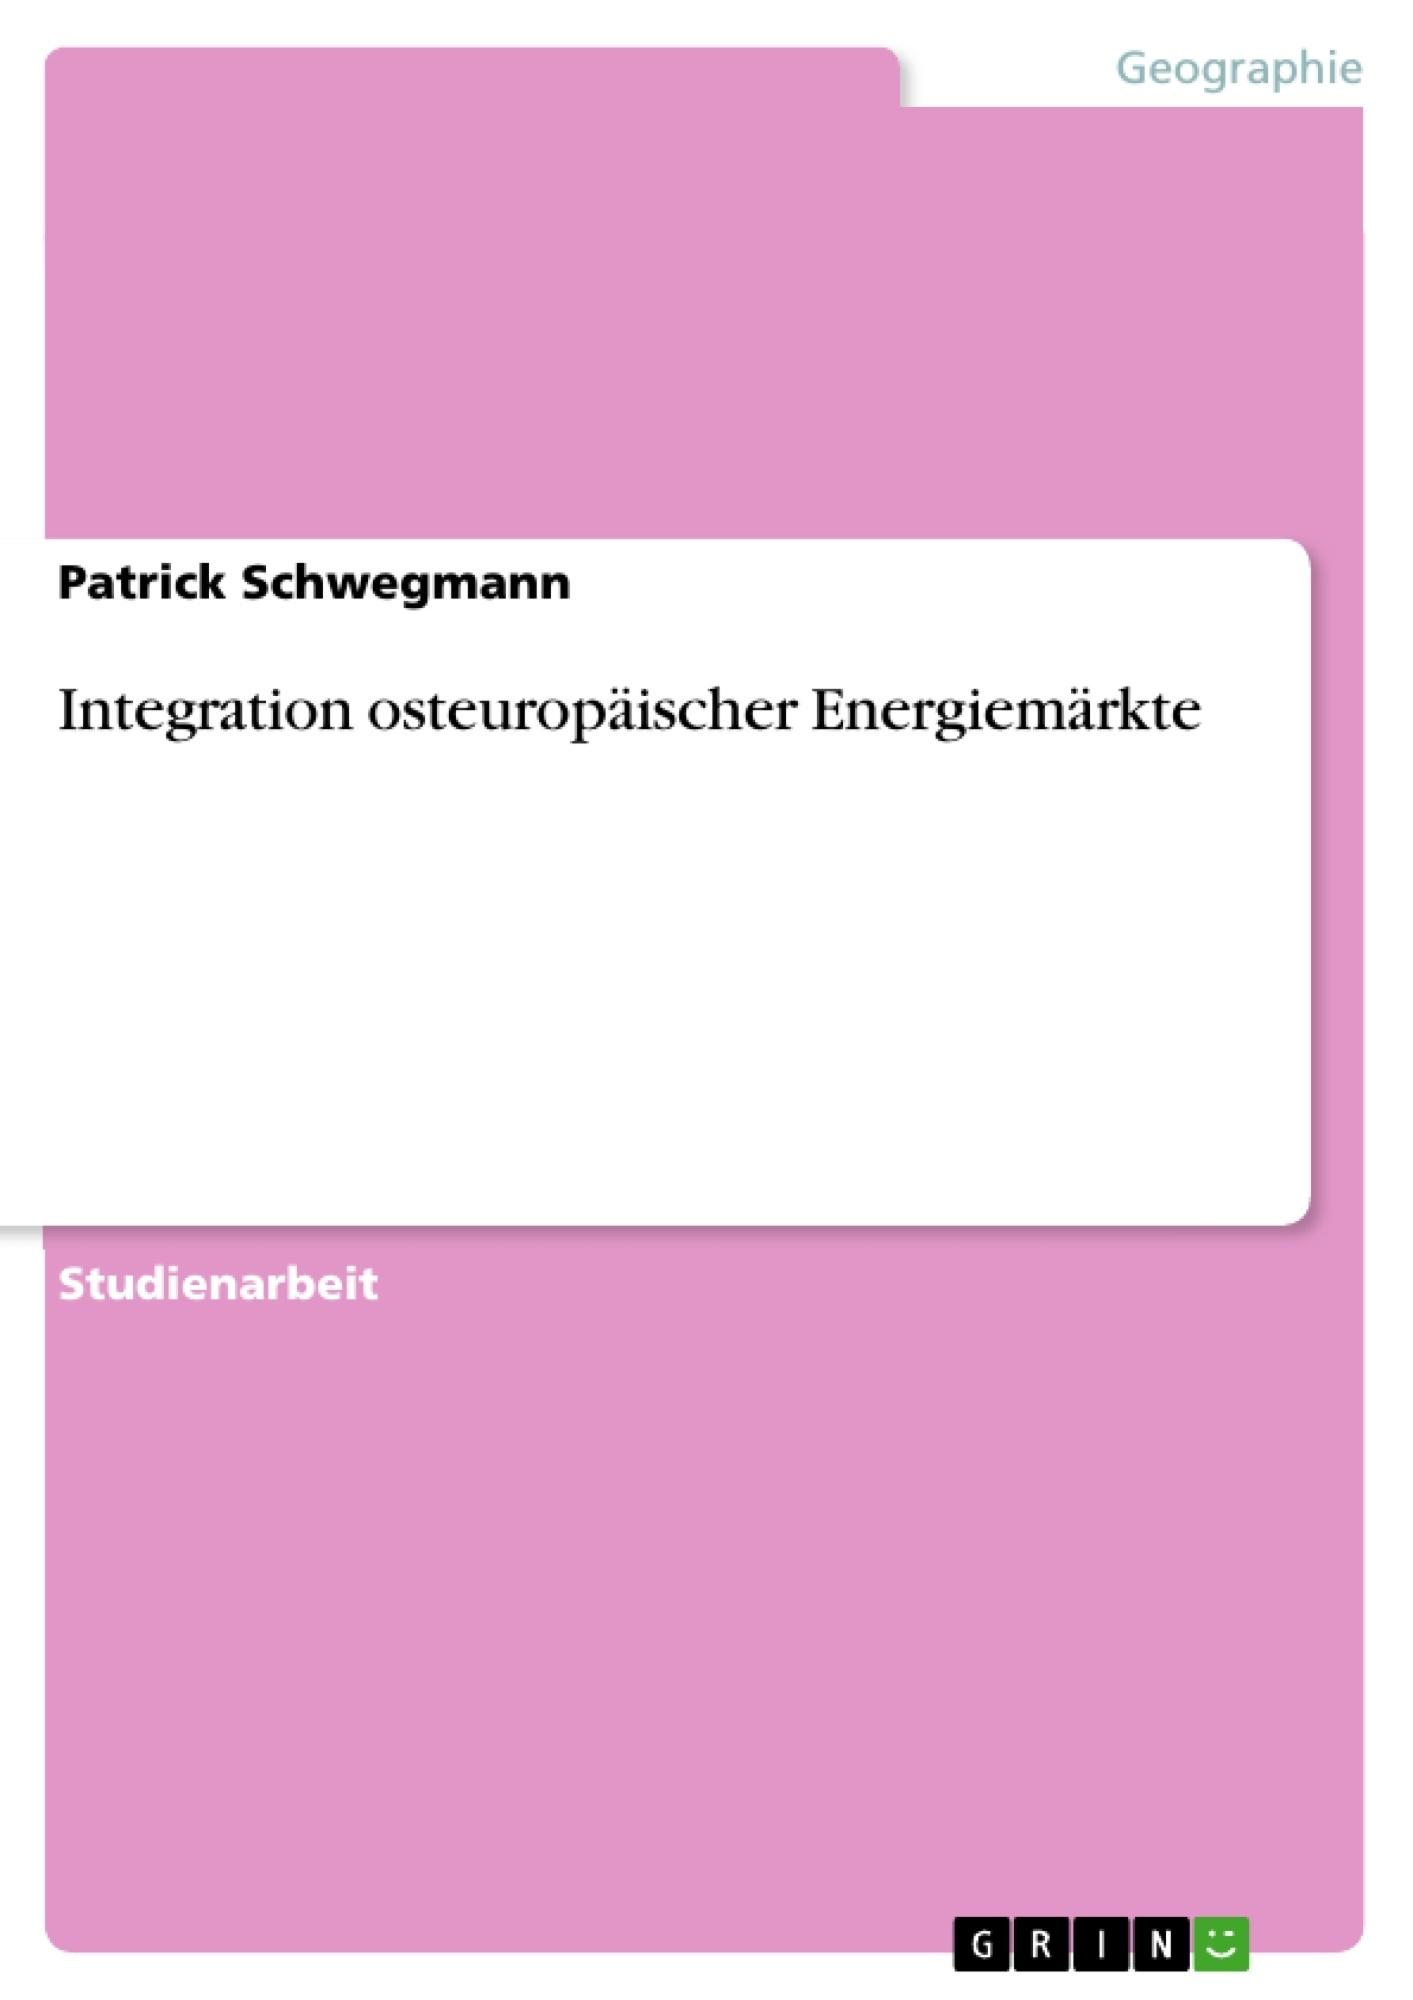 Titel: Integration osteuropäischer Energiemärkte